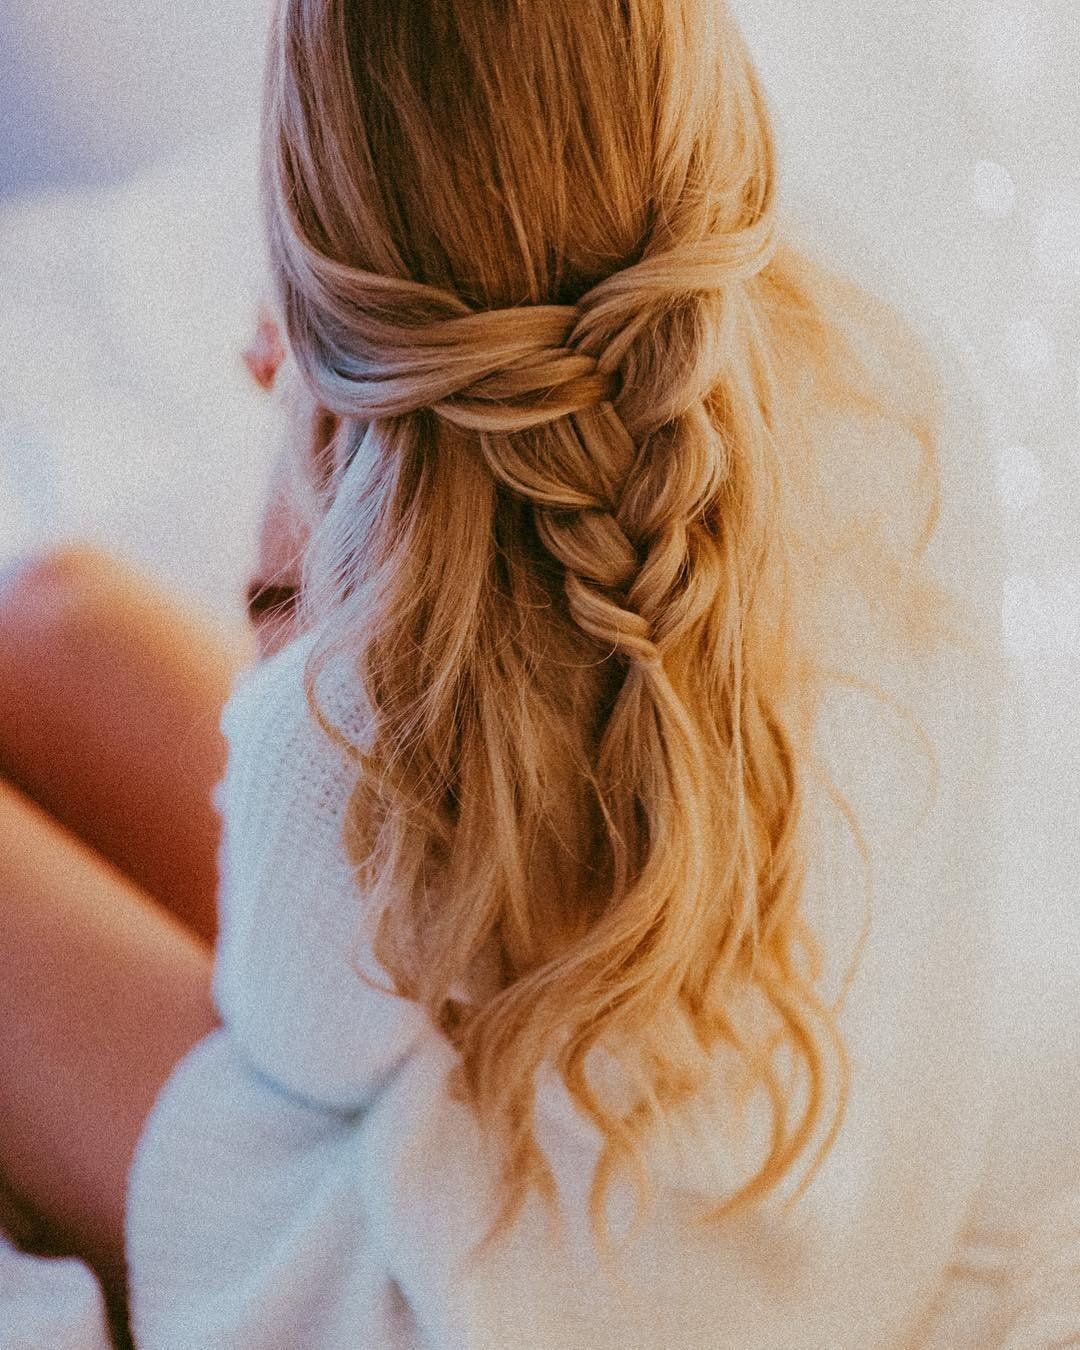 Pin by amelia galehasleham on hair u makeup pinterest rupi kaur